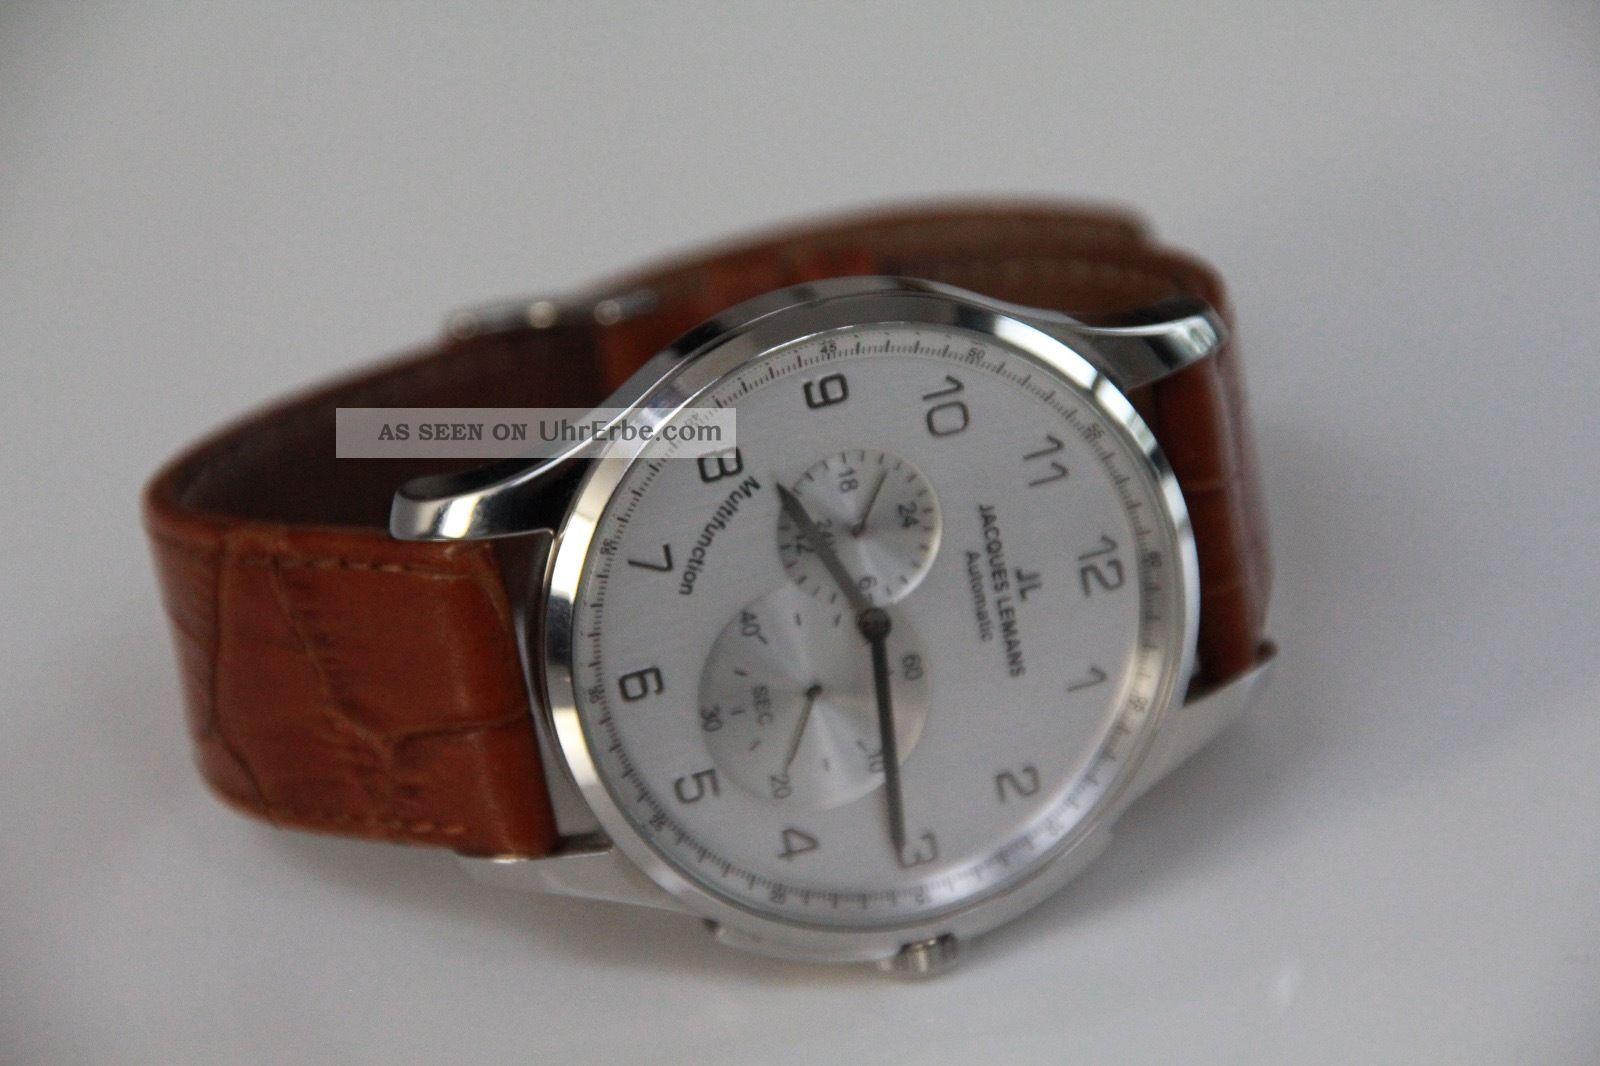 Jacques Lemans Automatik Herren Armbanduhr 1 - 1525 Silbernes Zifferblatt Armbanduhren Bild